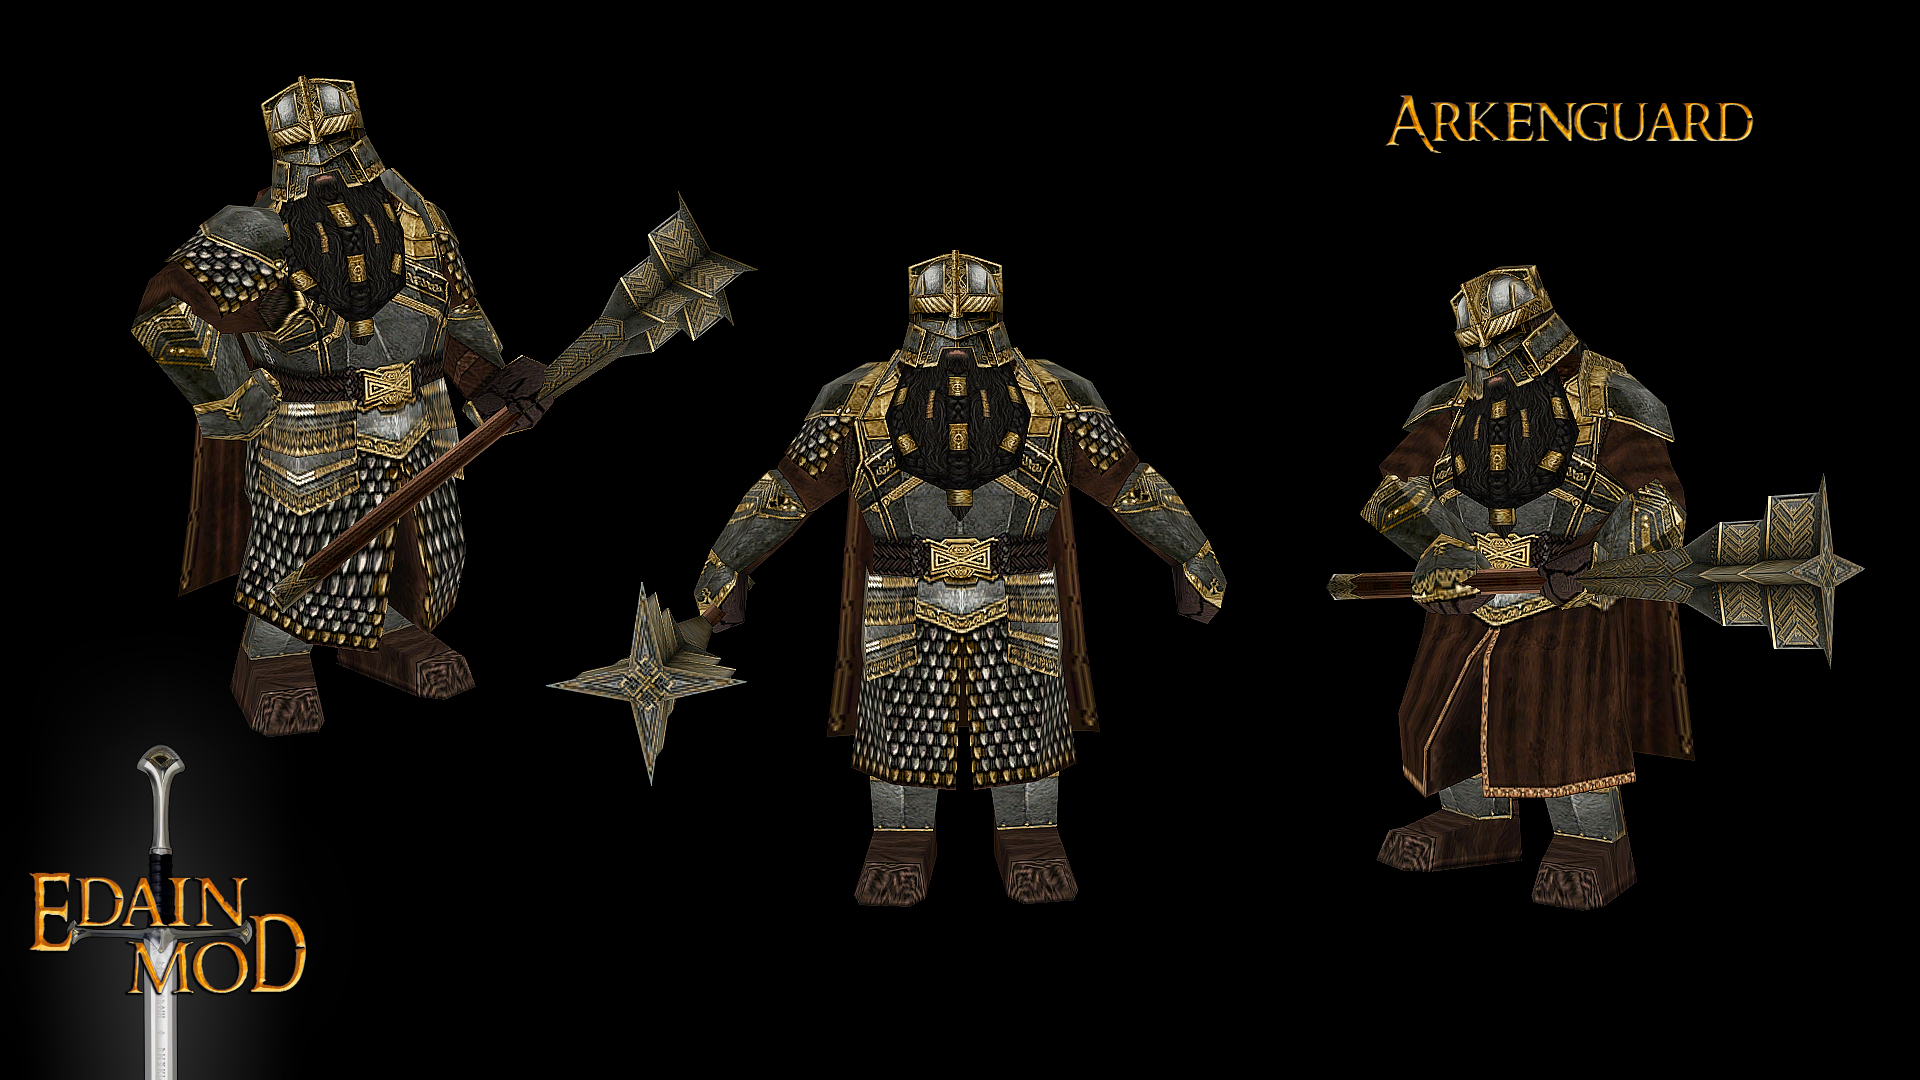 Erebor Arkenguard Image Edain Mod For Battle For Middle